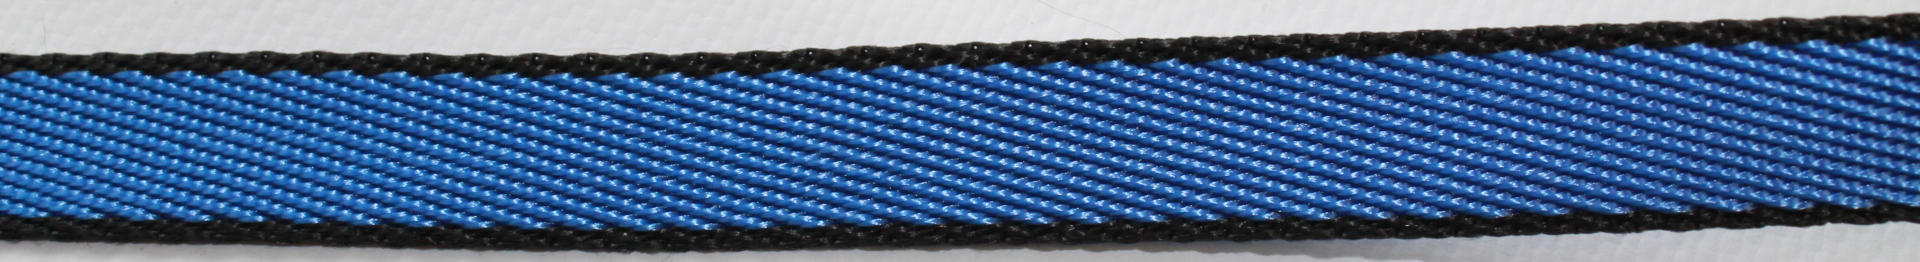 Фото - Поводок для собак Happy Friends, цвет: синий, ширина 1 см, длина 1,20 м боди детский luvable friends 60325 f бирюзовый р 55 61